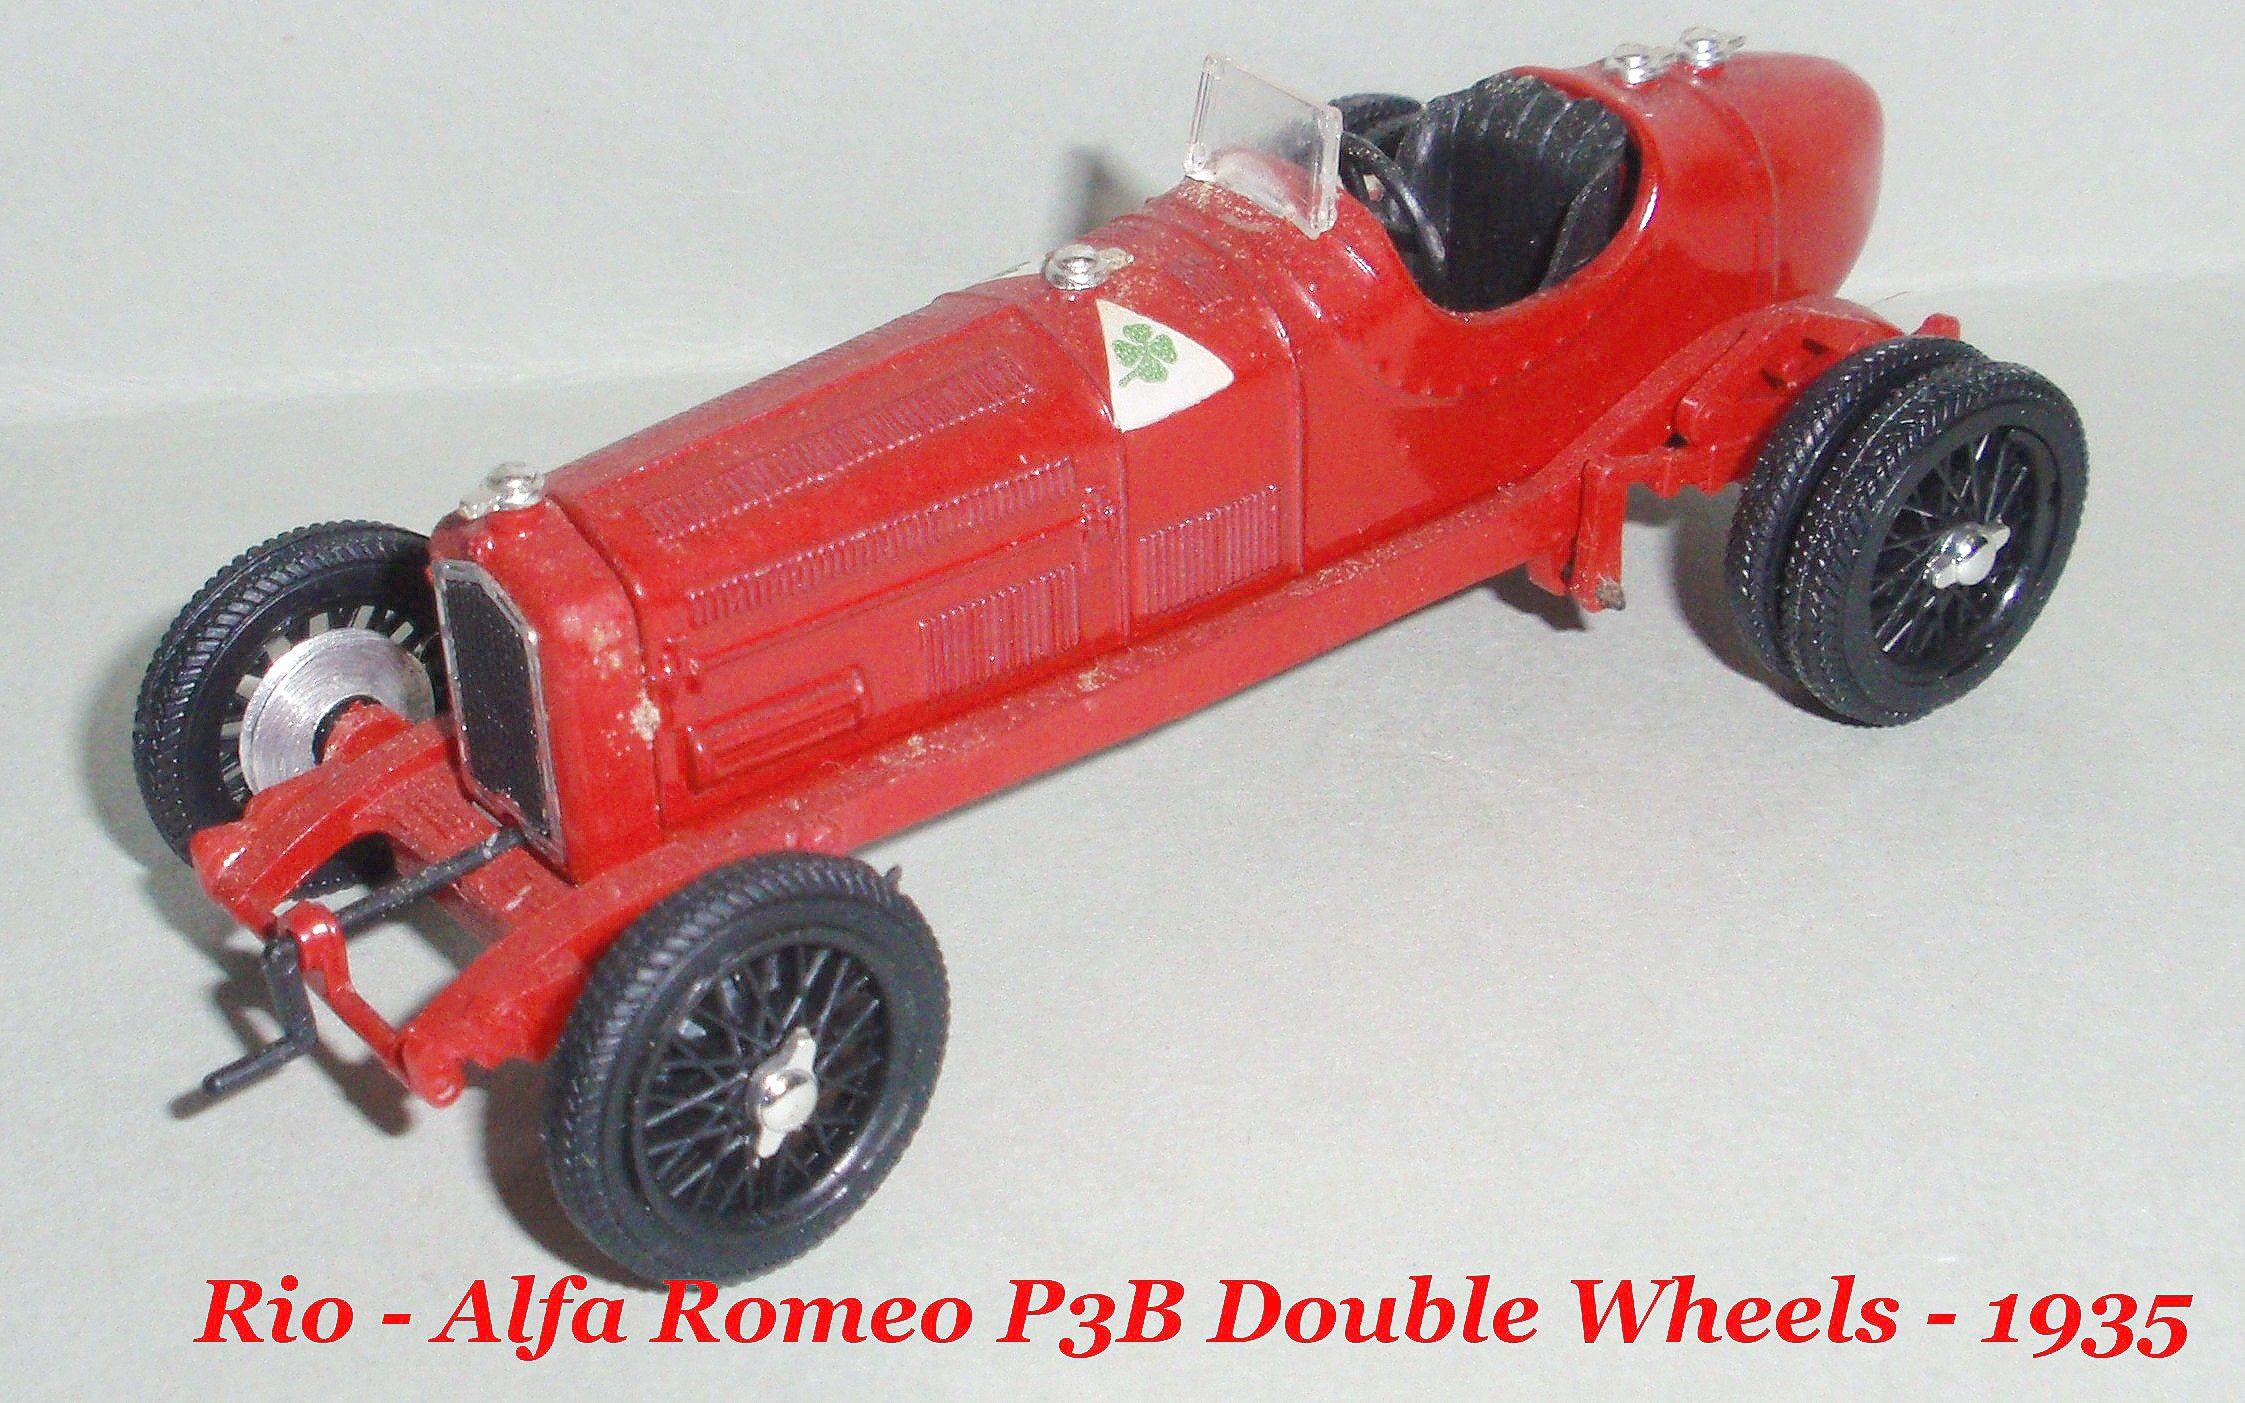 Mod 1 43 Rio Alfa Romeo P3B Double Wheels 1935